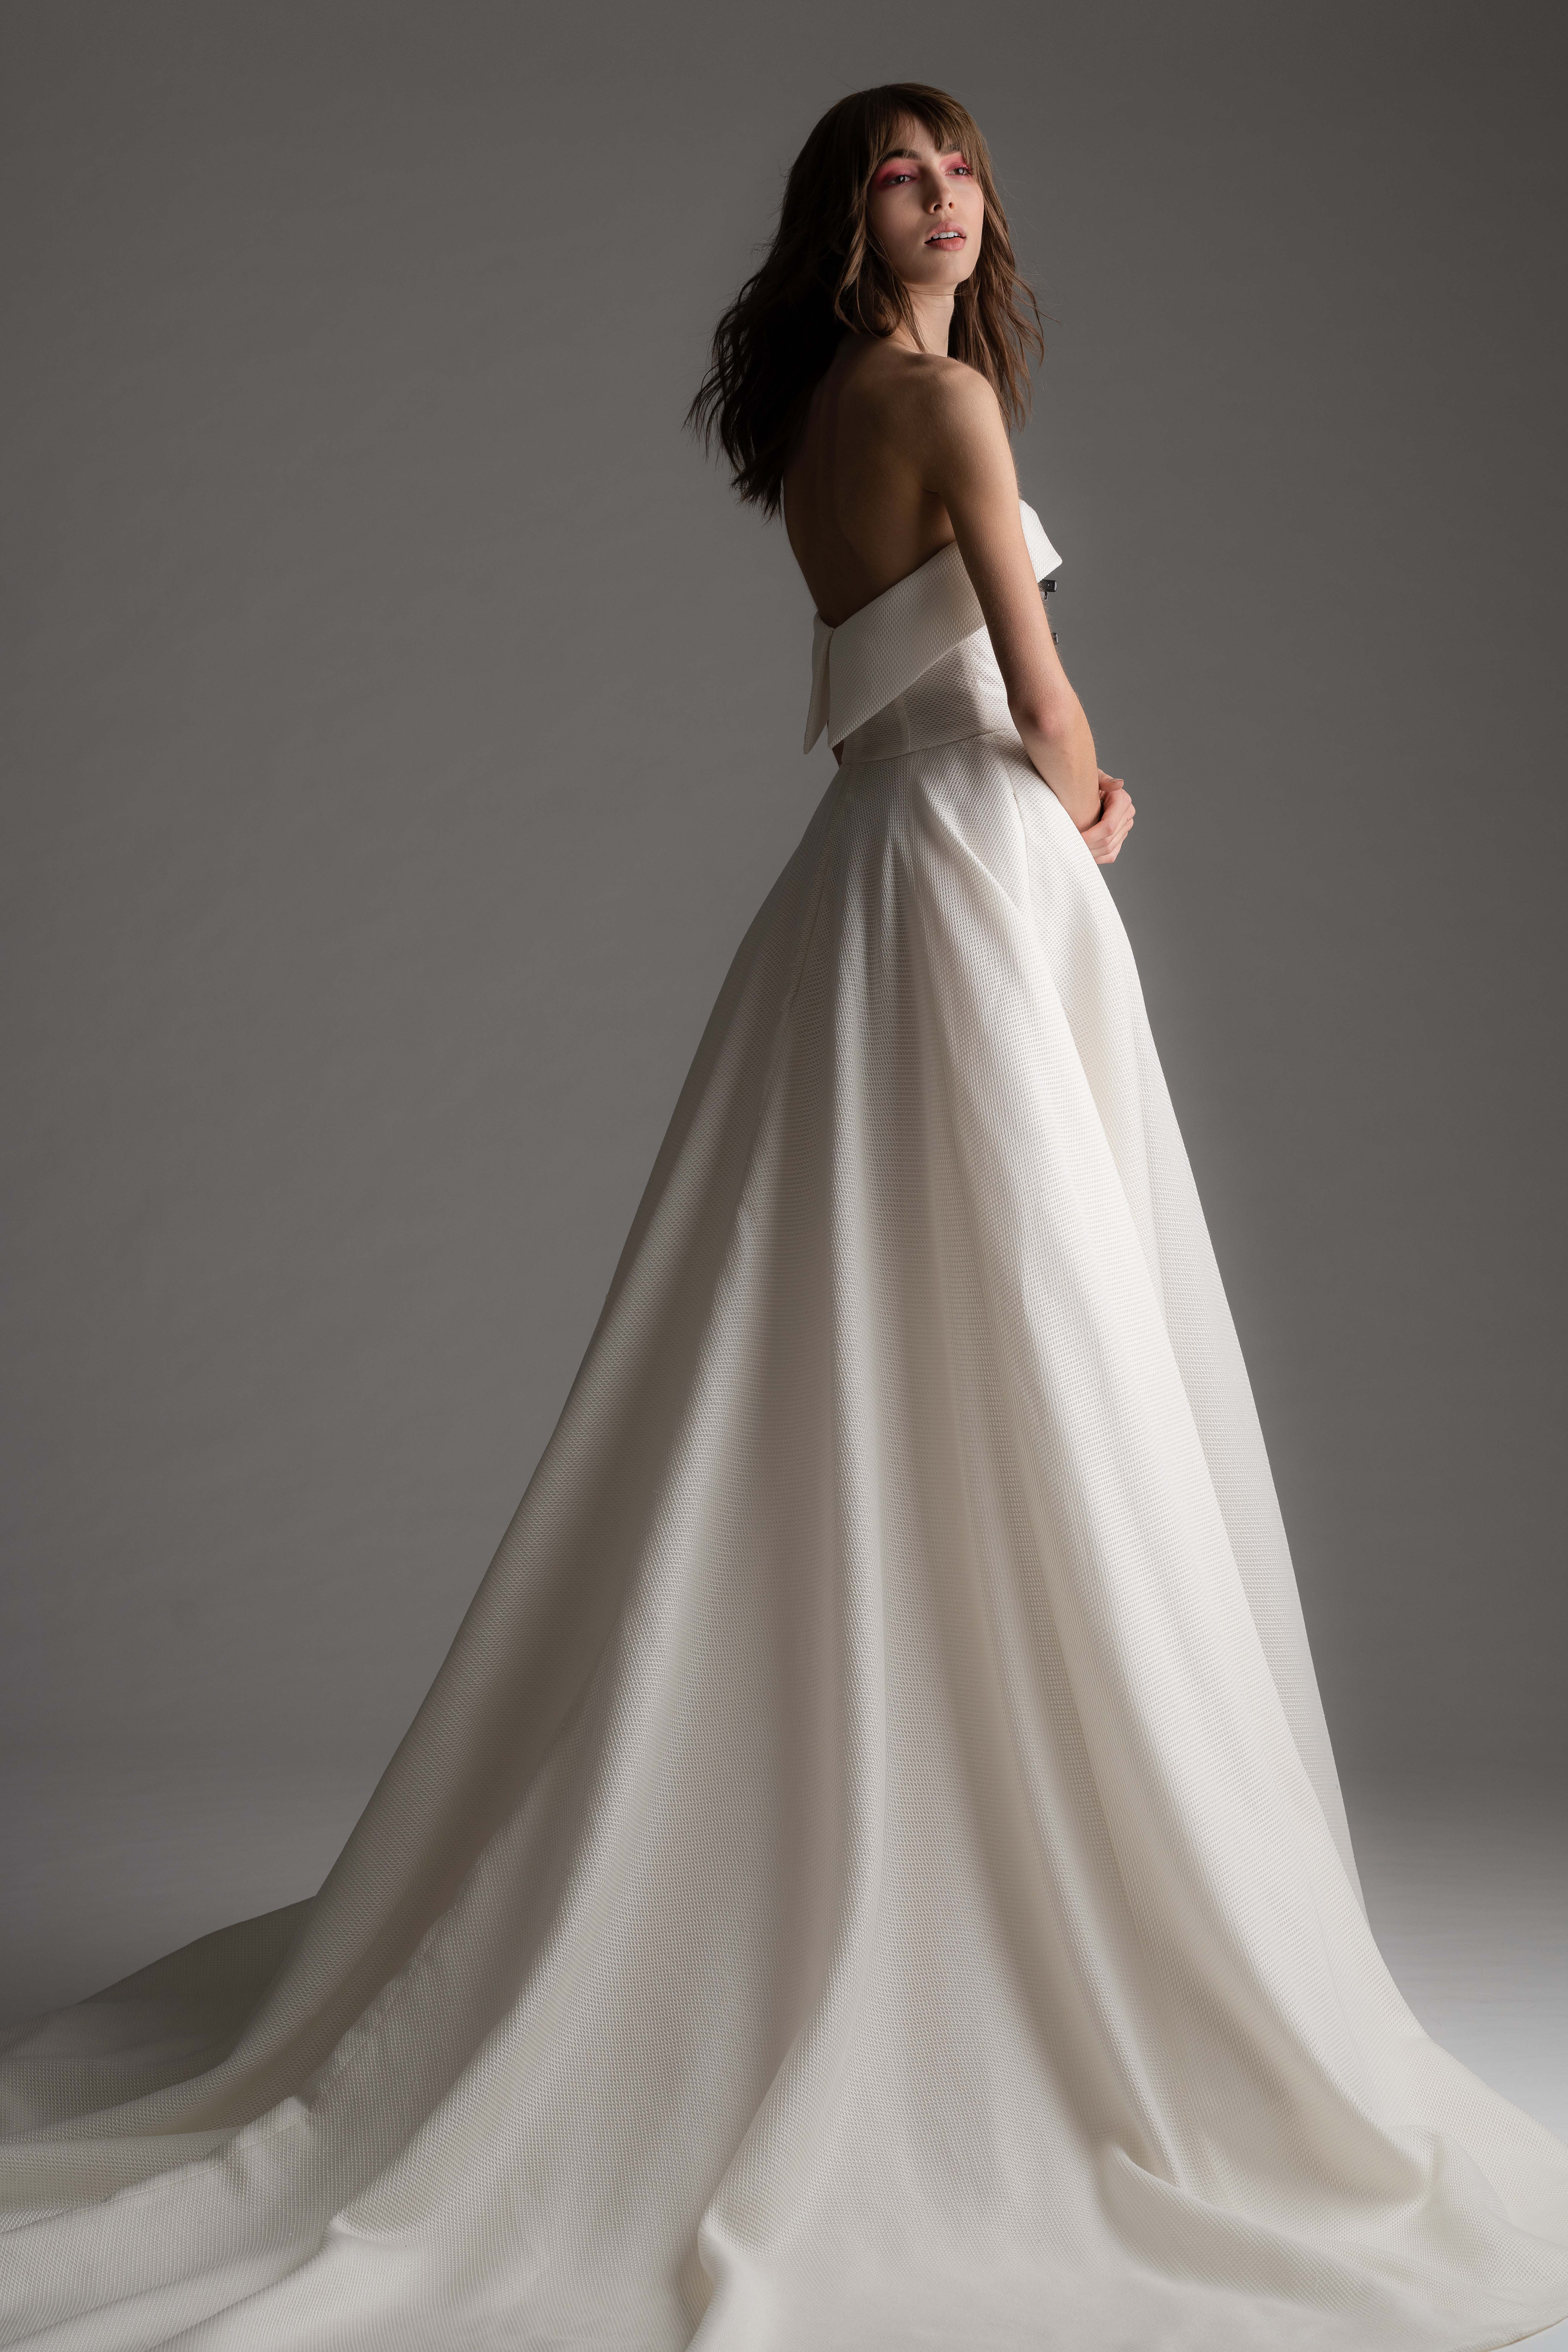 rivini by rita fall 2019 strapless a-line wedding dress